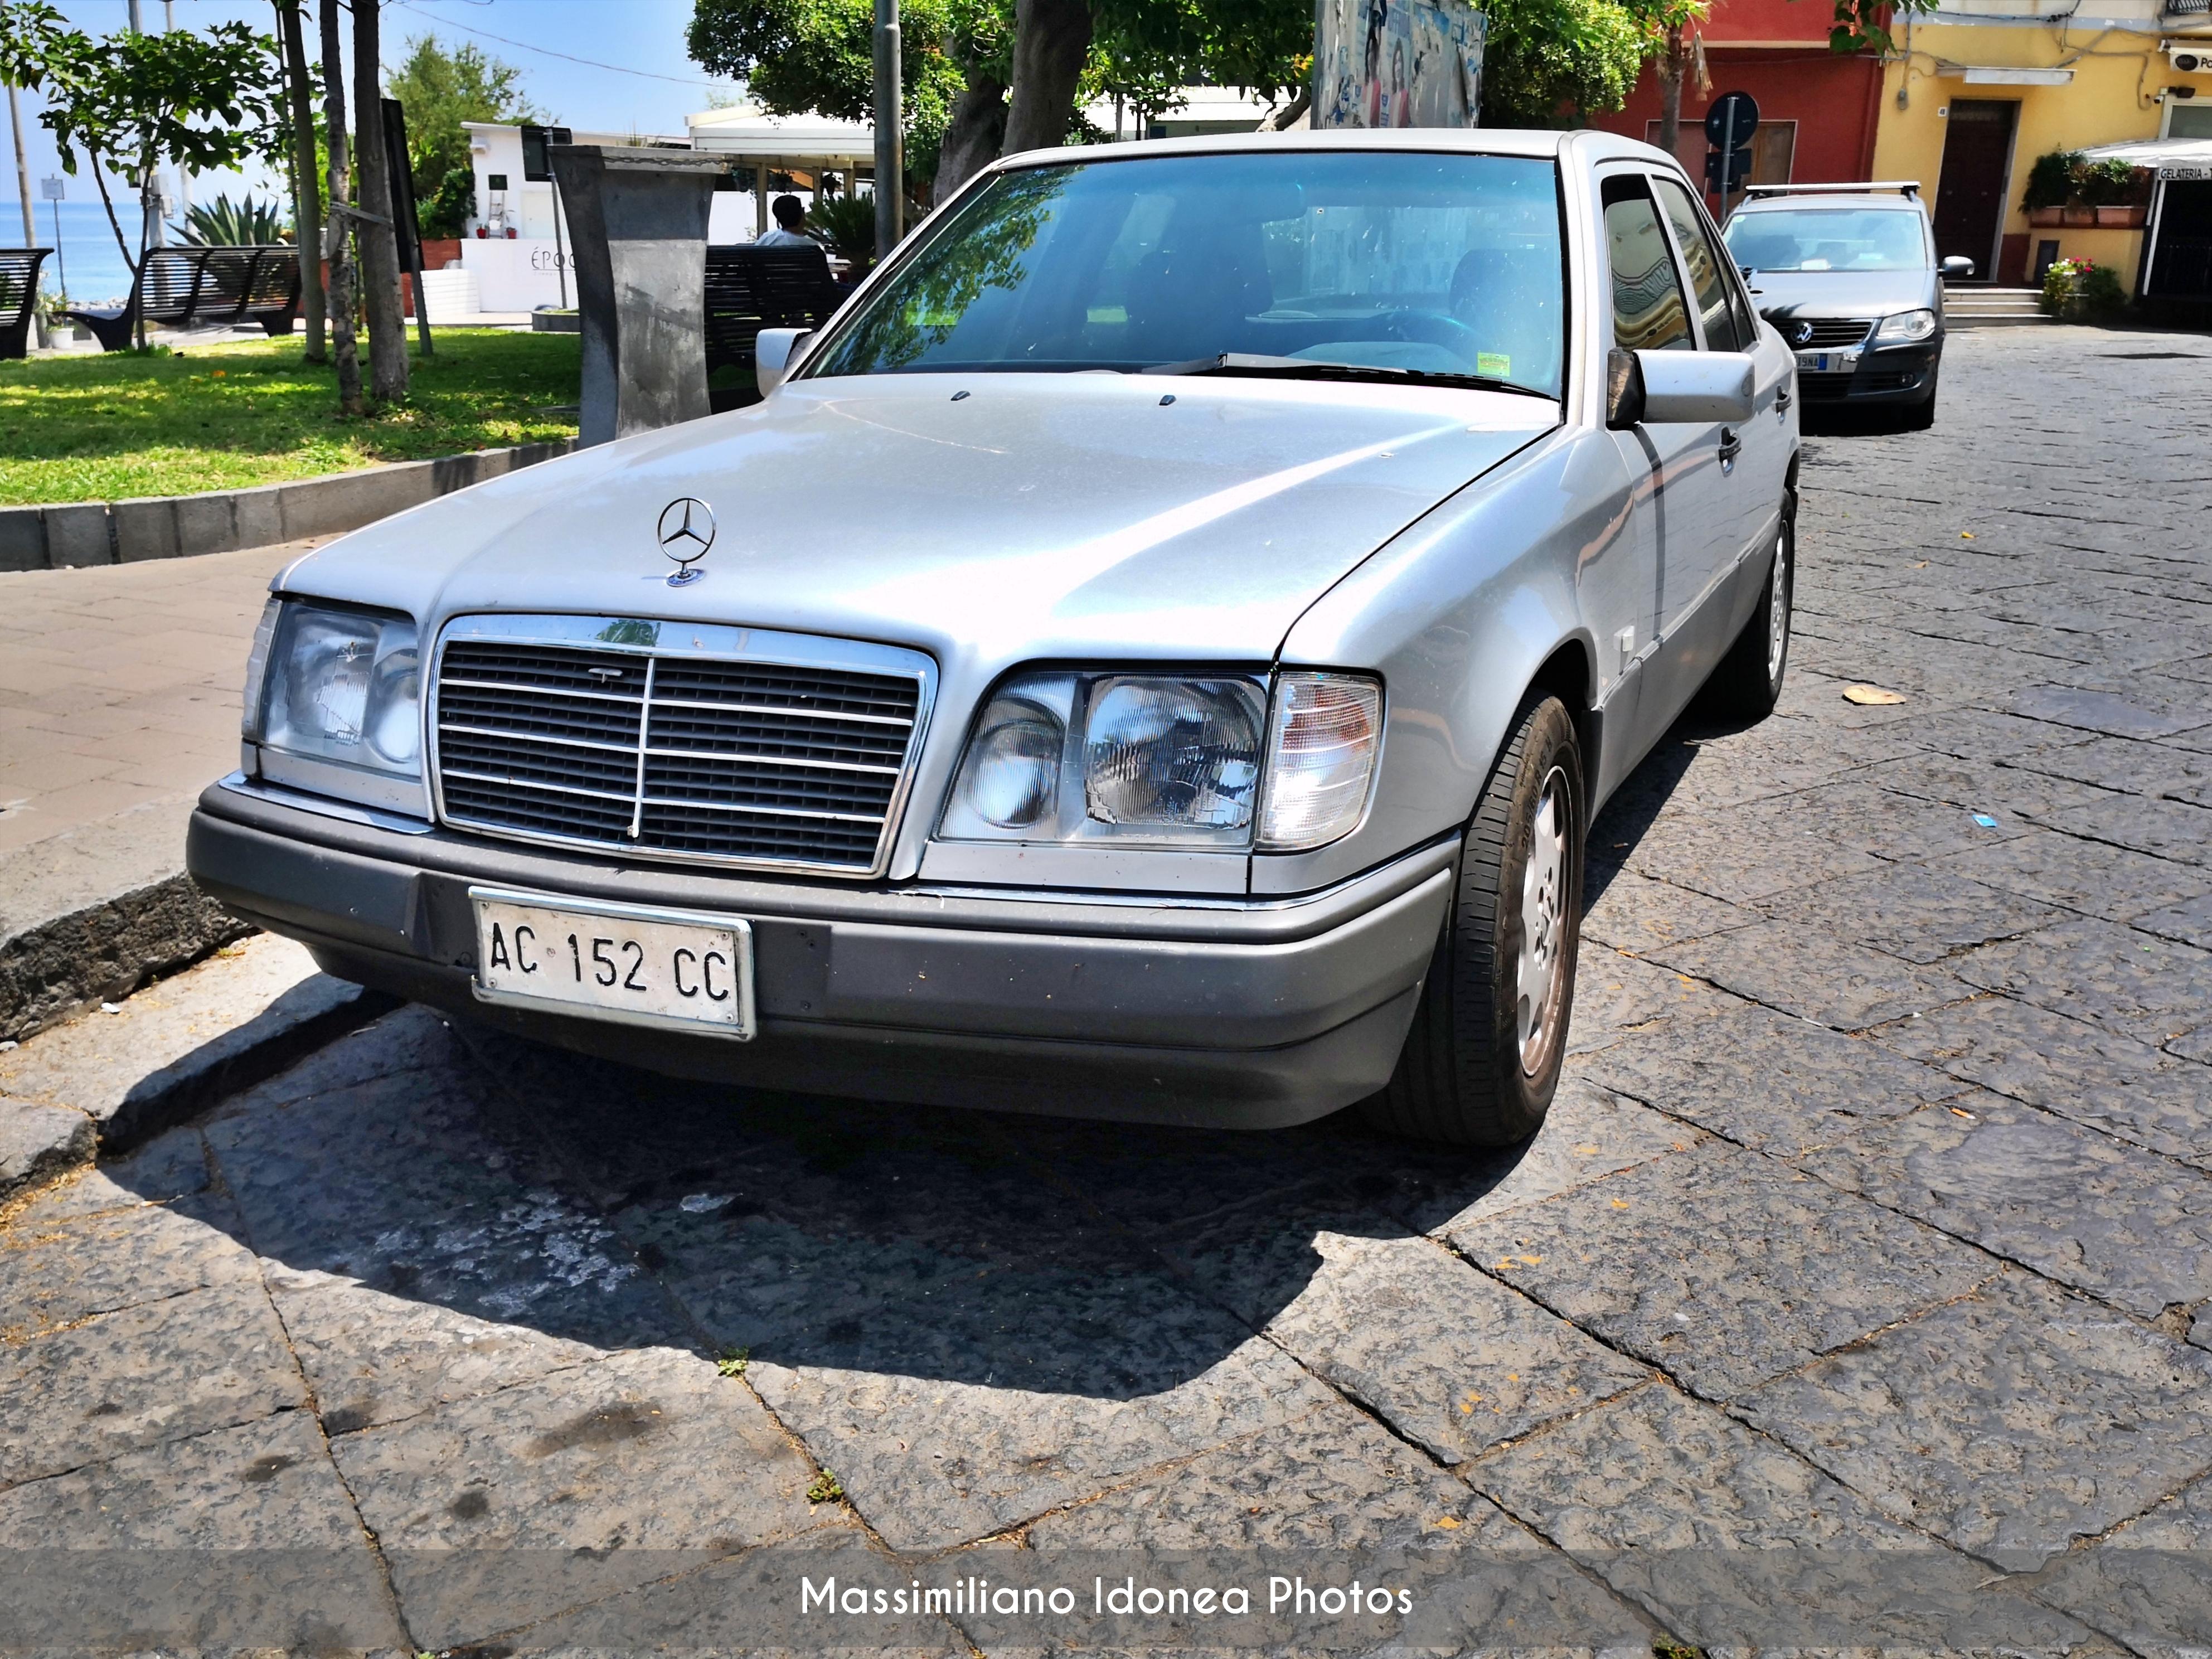 avvistamenti auto storiche - Pagina 8 Mercedes-W124-250-D-2-5-94cv-93-AC152-CC-620-737-11-11-2019